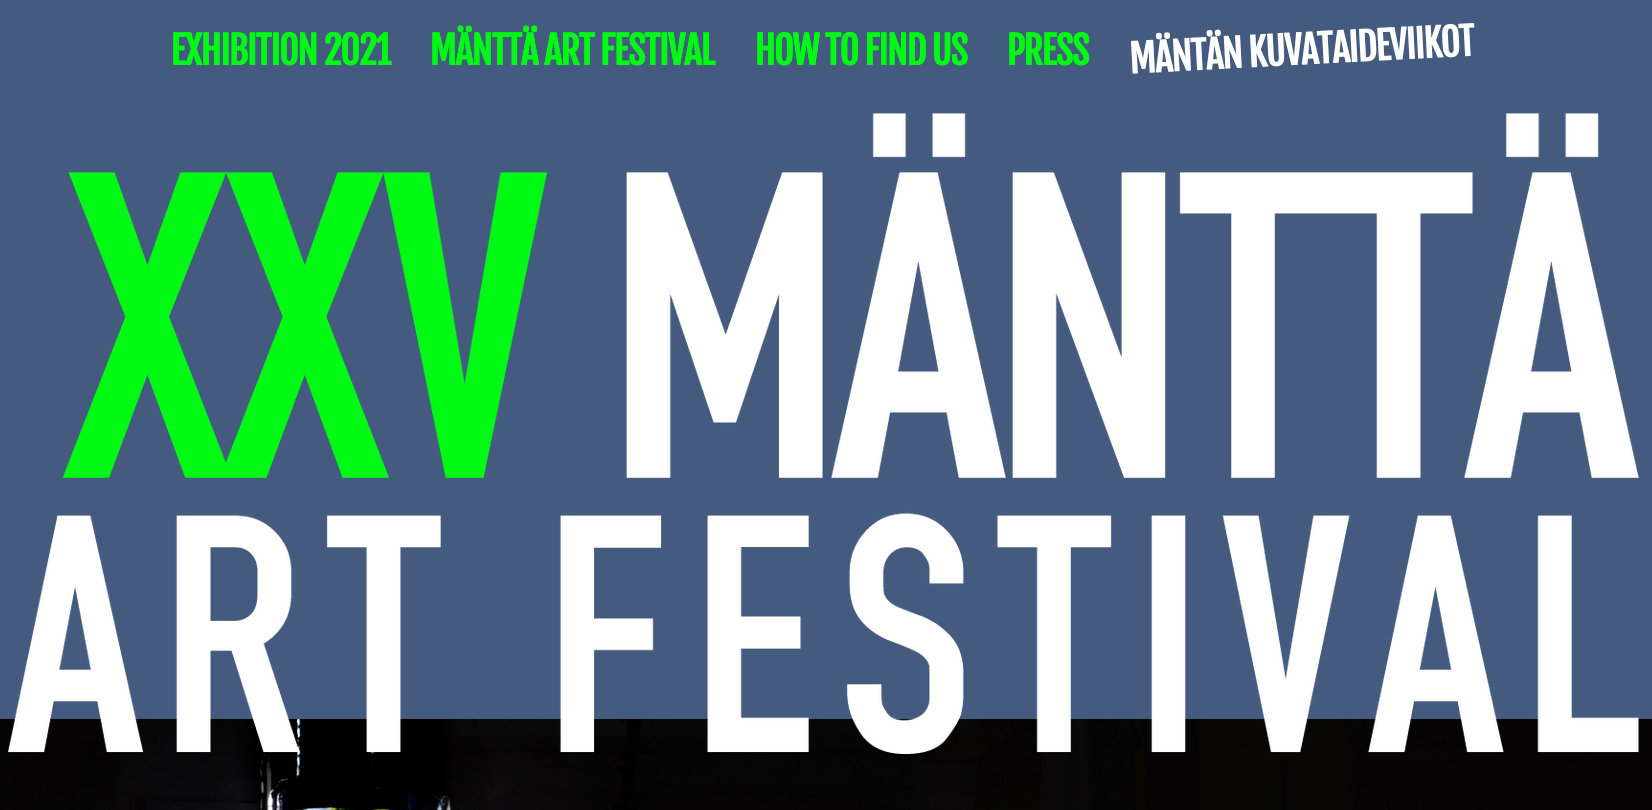 Performative Habitats di Egle Oddo al Festival di Mänttä | dal 12-15.6.2021